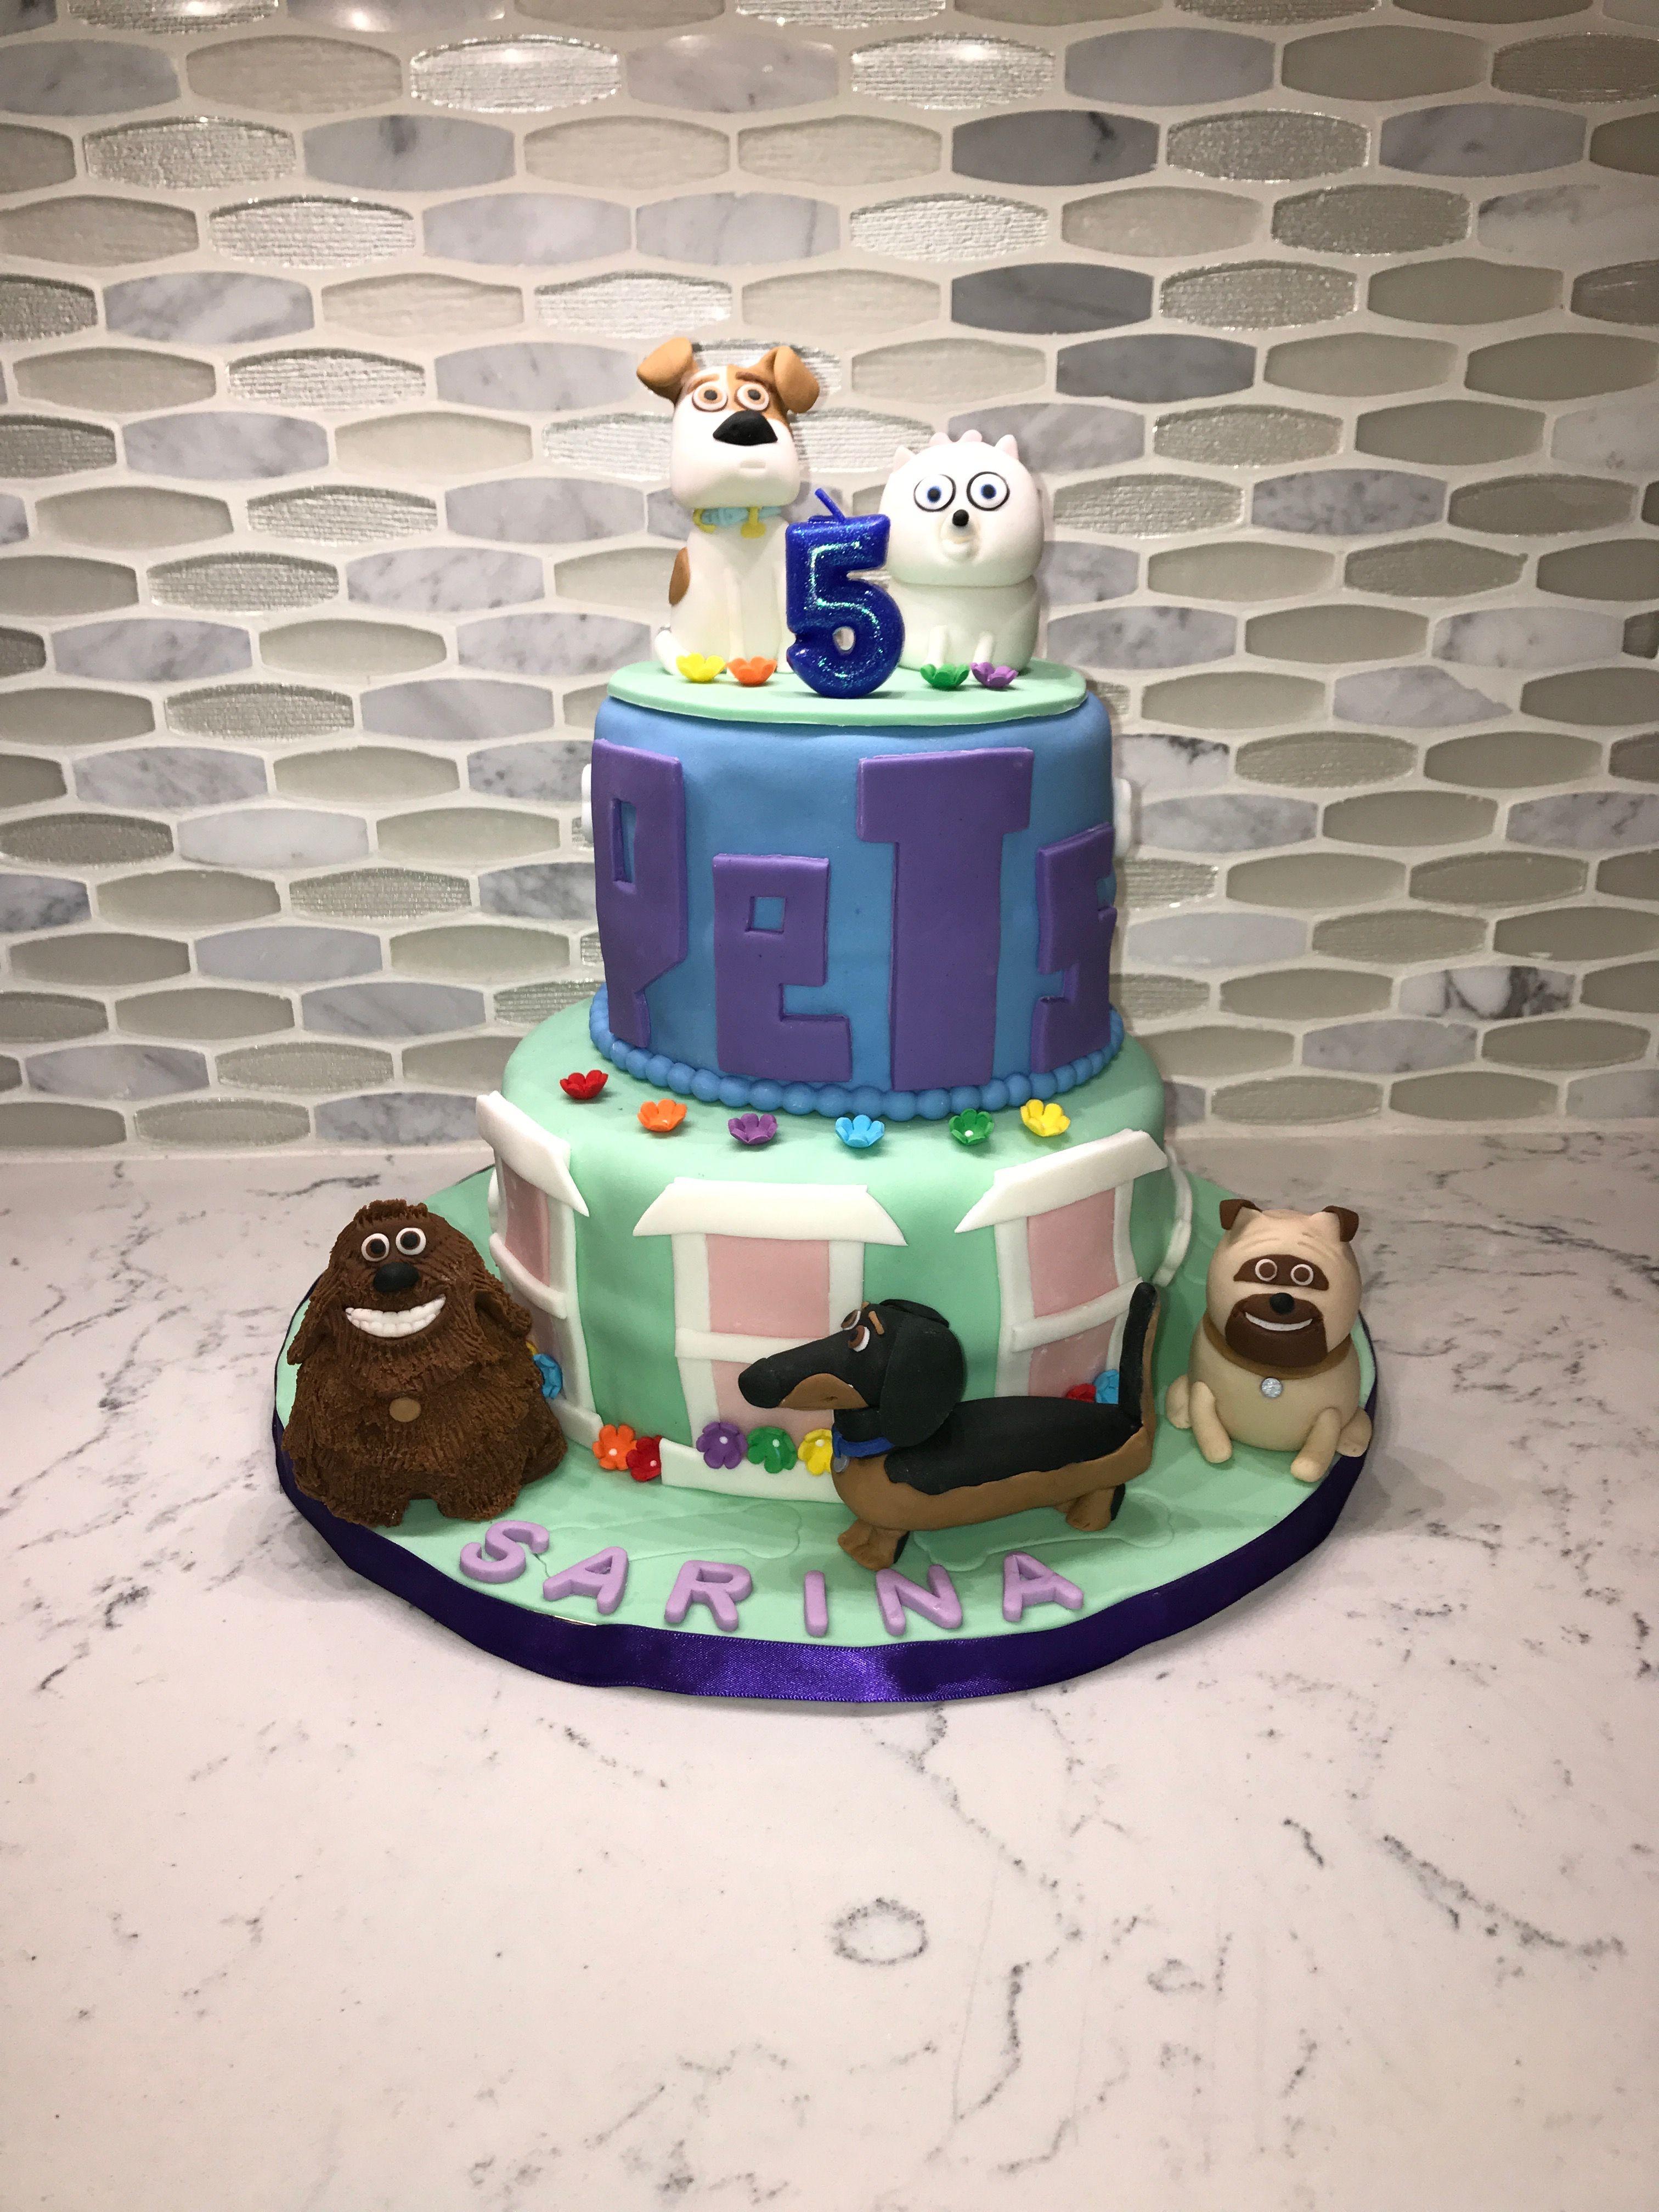 The Secret Life Of Pets Cake Cake Designs Secret Life Of Pets